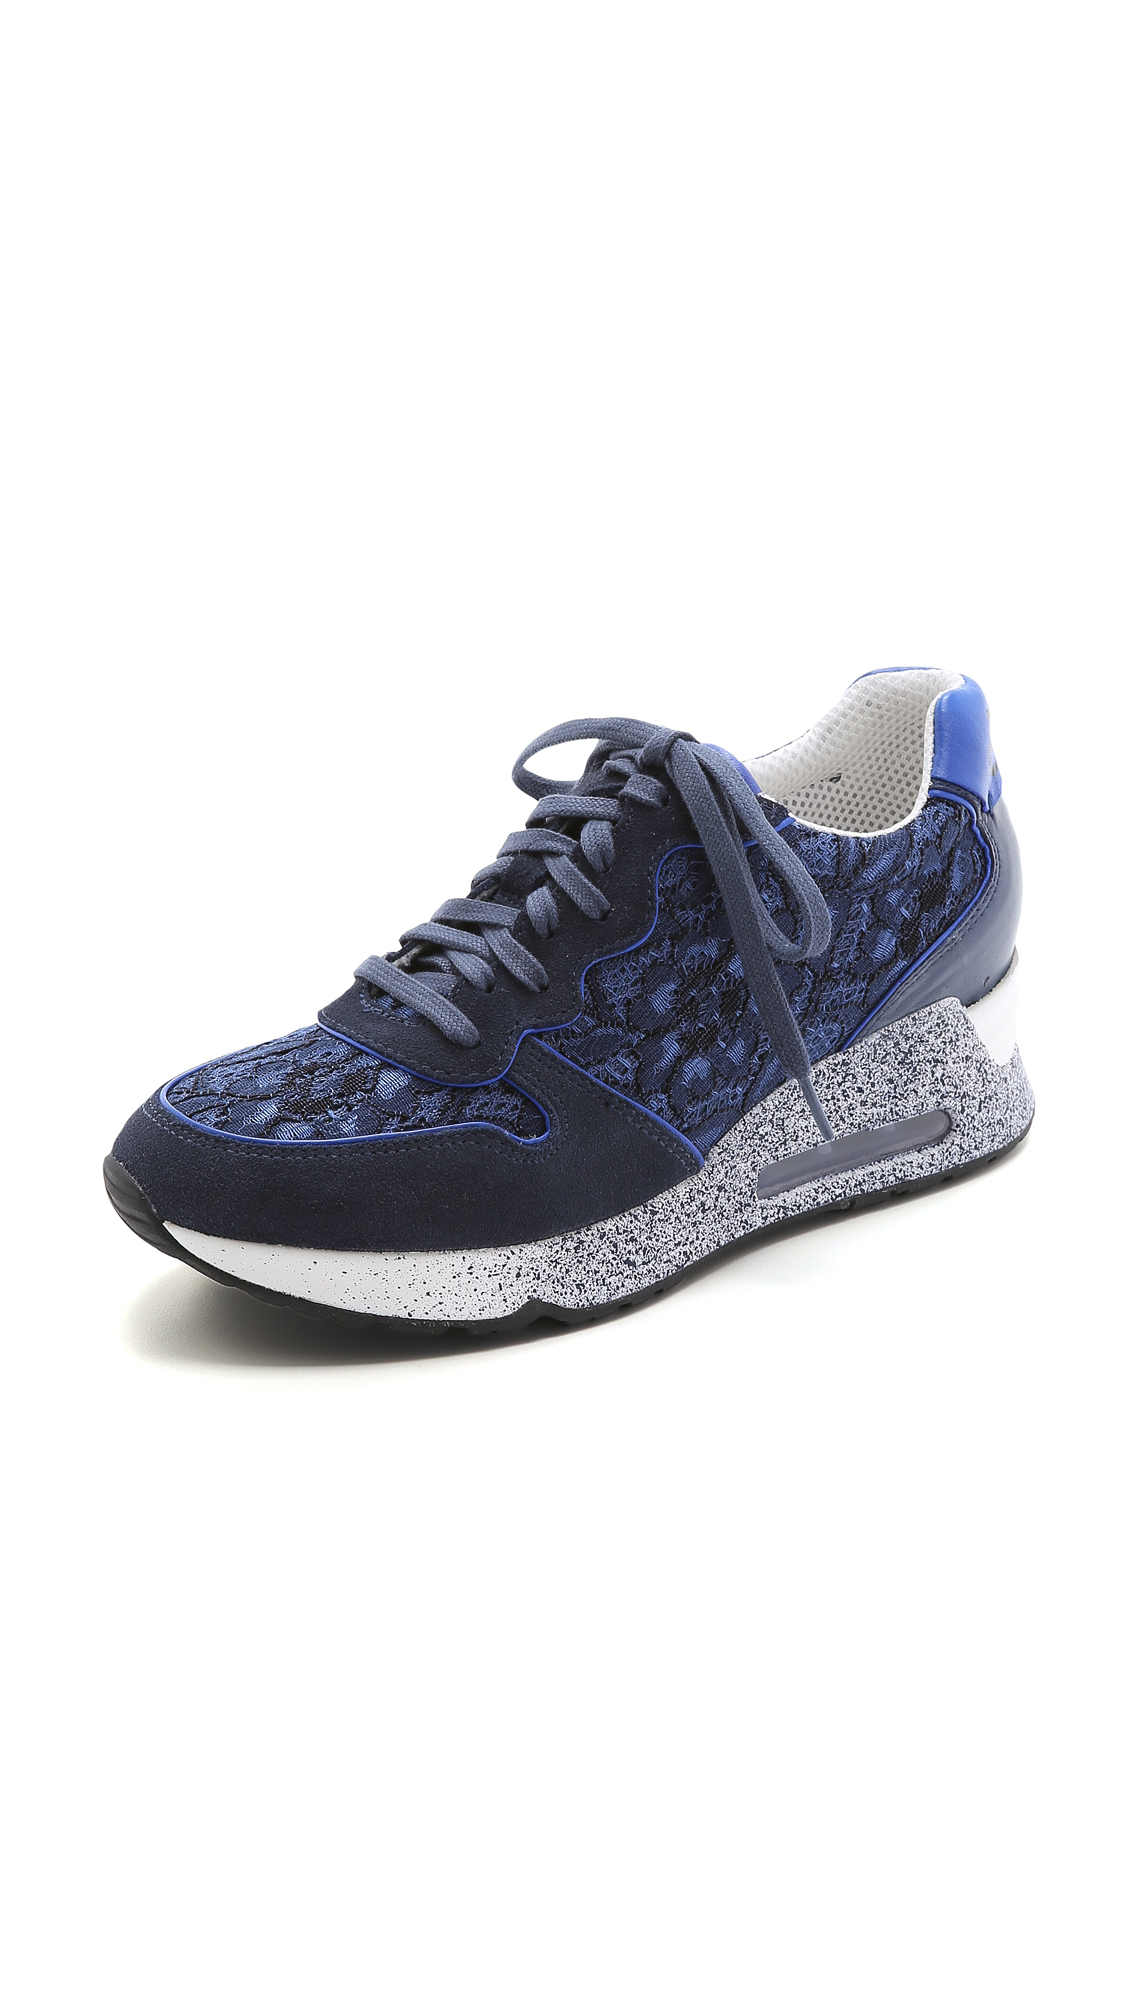 Us Shoe Size  European